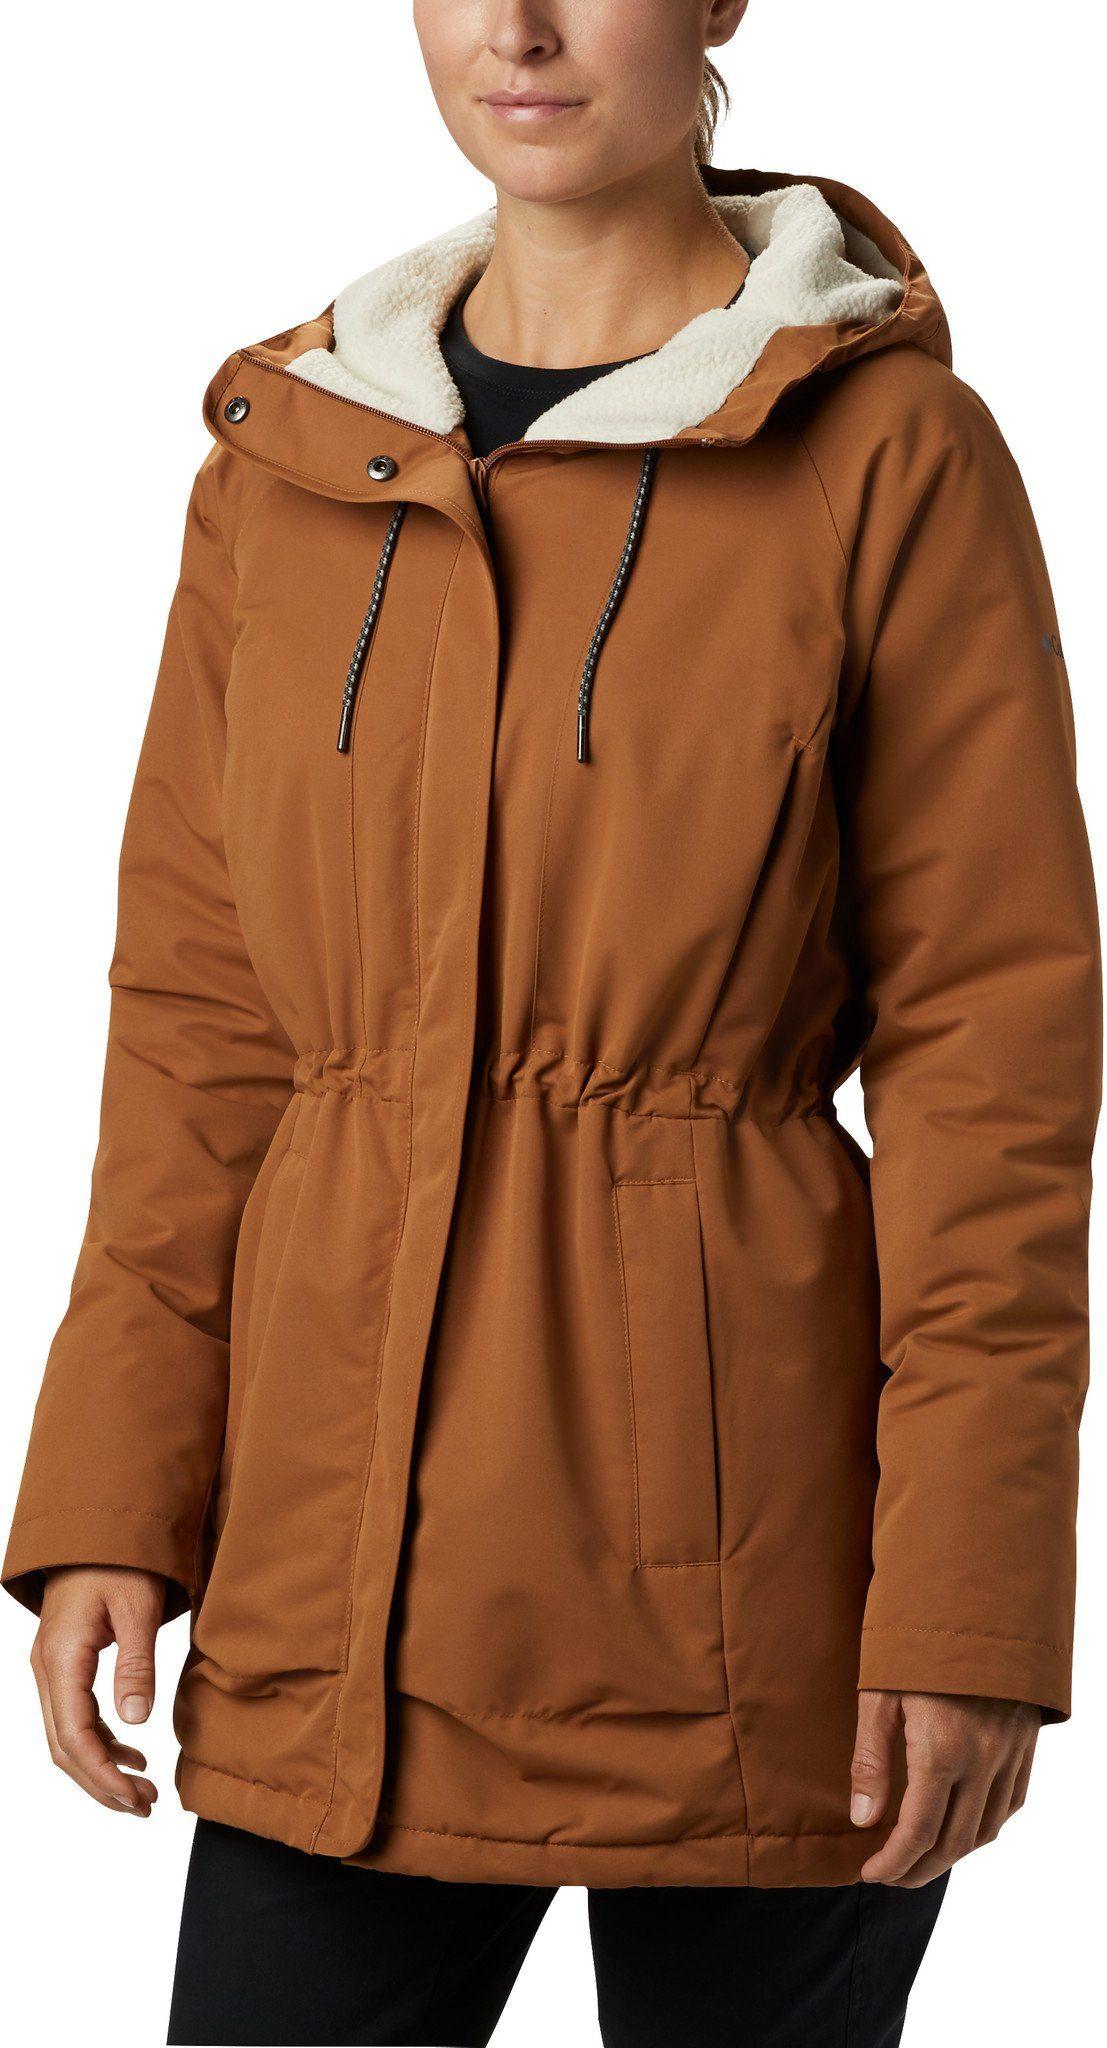 Columbia Outdoorjacke »South Canyon Sherpa Gefütterte Jacke Damen« online kaufen   OTTO